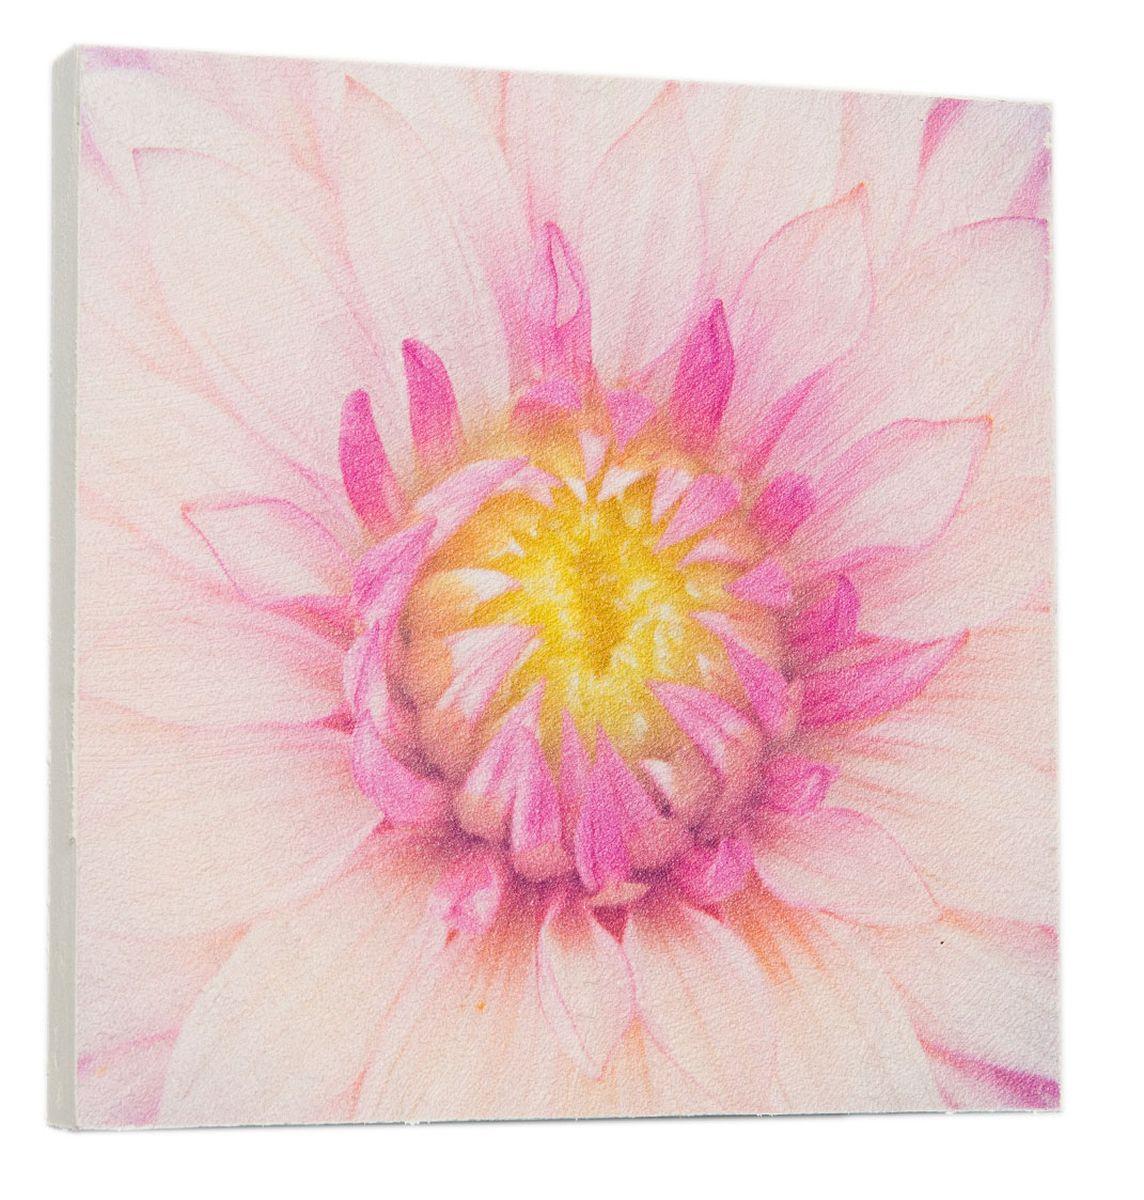 Картина Mister Poster Розовый лотос, 22 х 22 см картина mister poster розовые цветы вишни 22 х 14 5 см